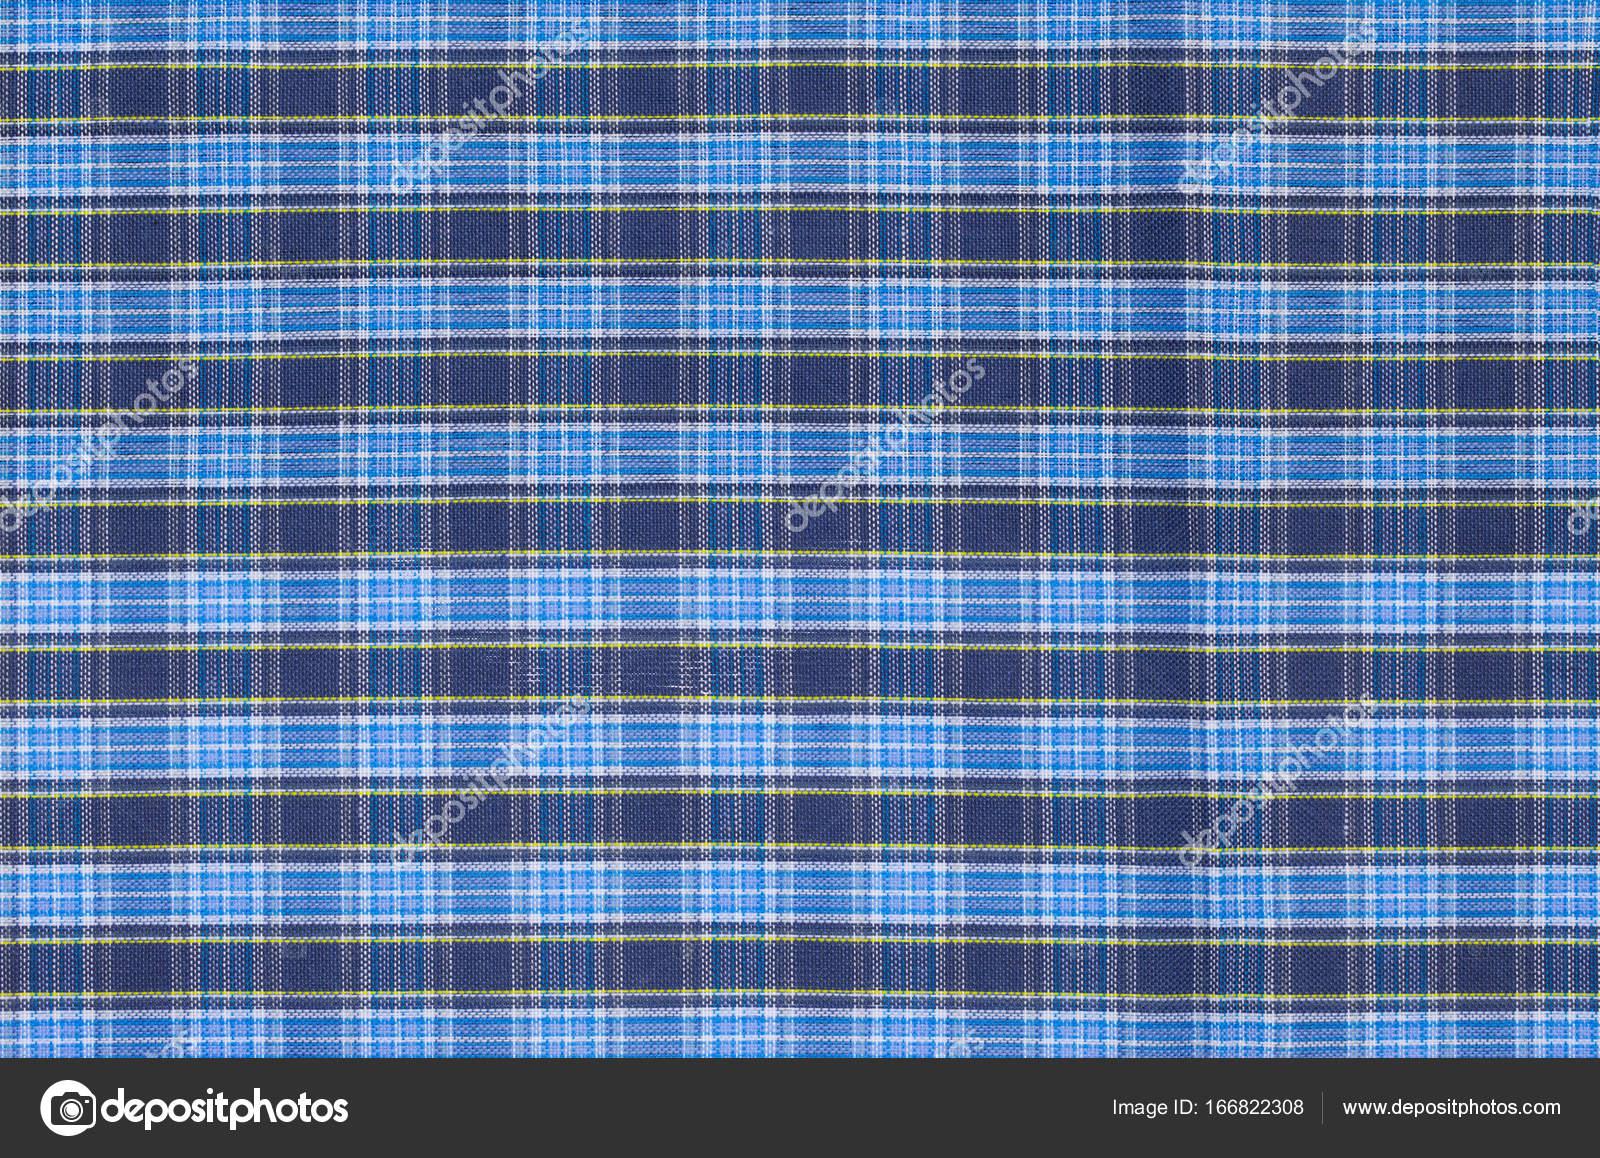 364a2b2711 textura xadrez tecido — Fotografias de Stock © studio306stock #166822308